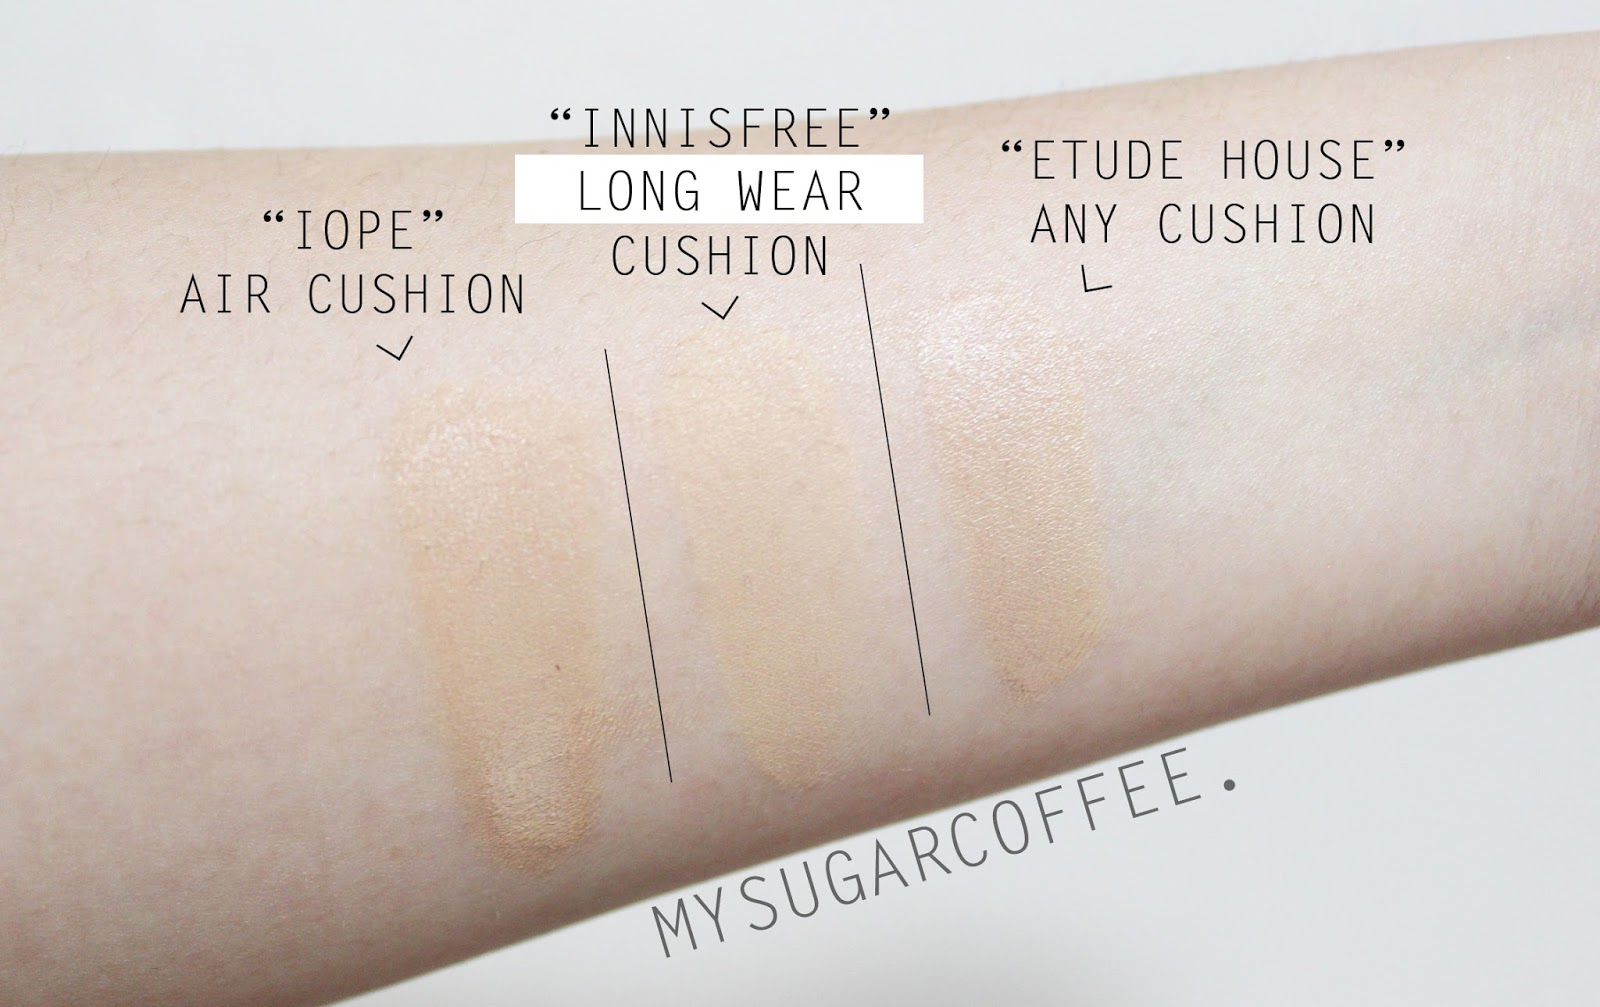 My Sugarcoffee Review Innisfree S Long Wear Cushion